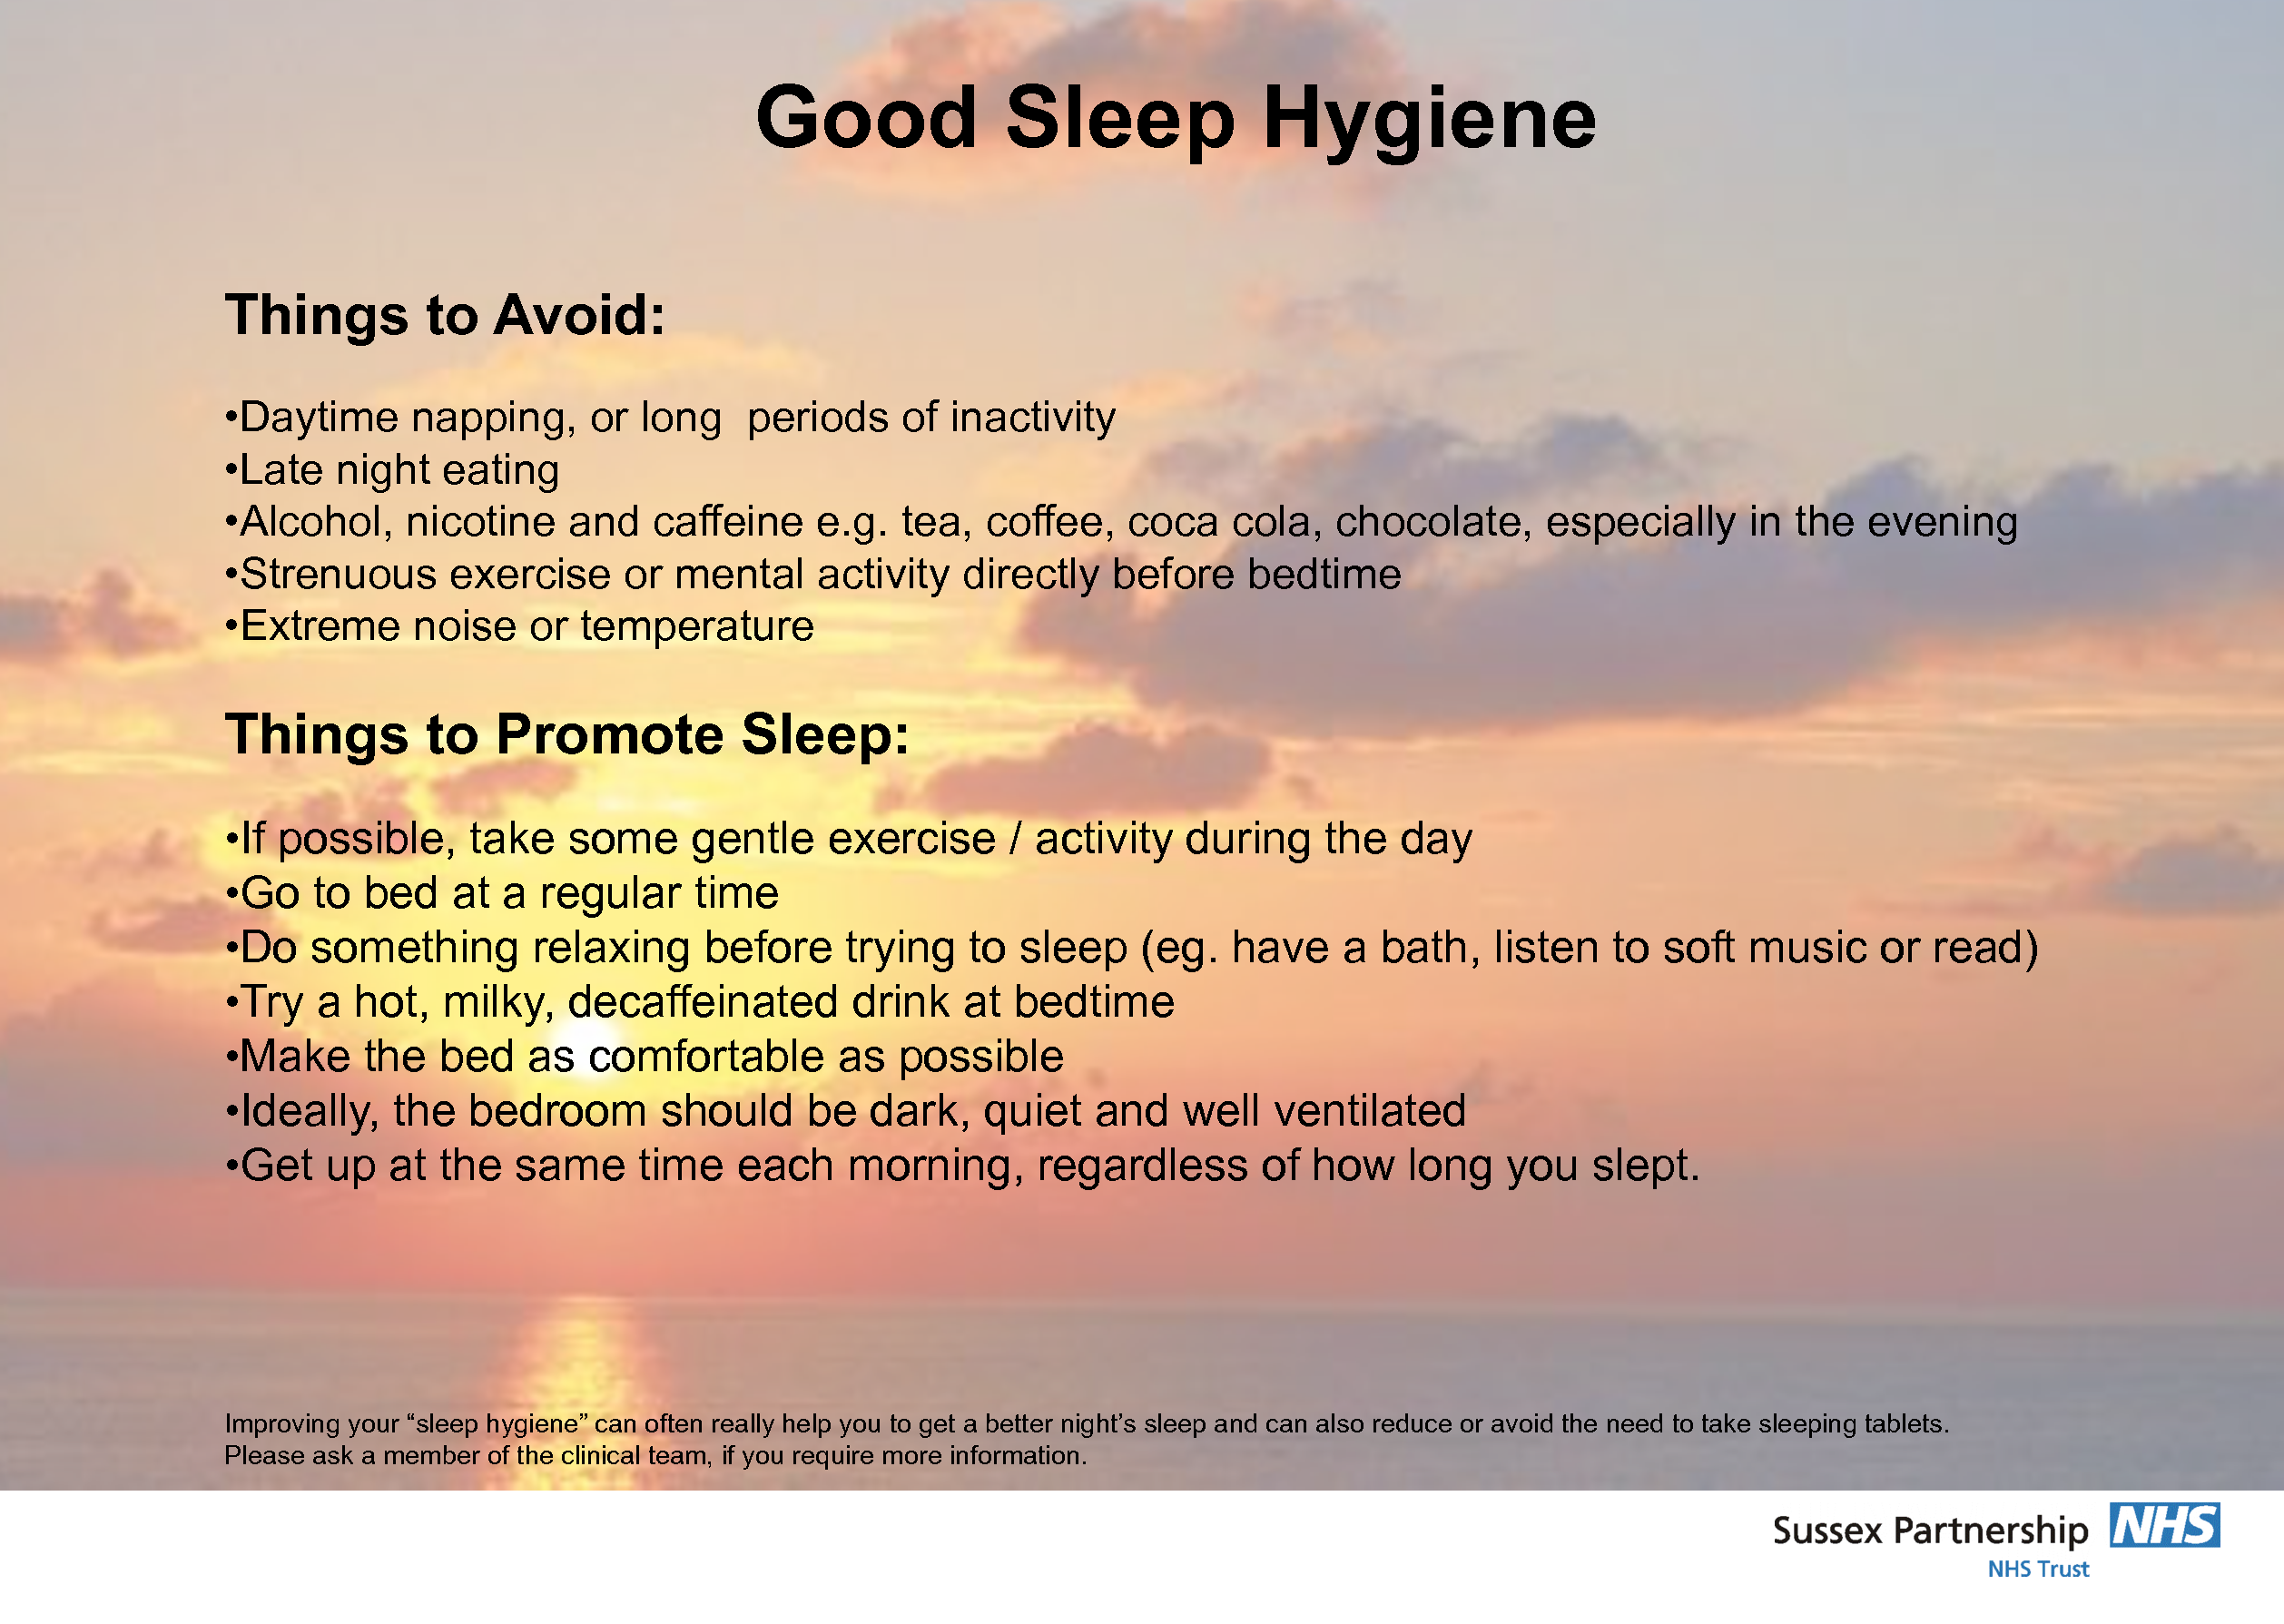 Free Printable Good Sleep Hygiene Good Sleep Hygiene Things To